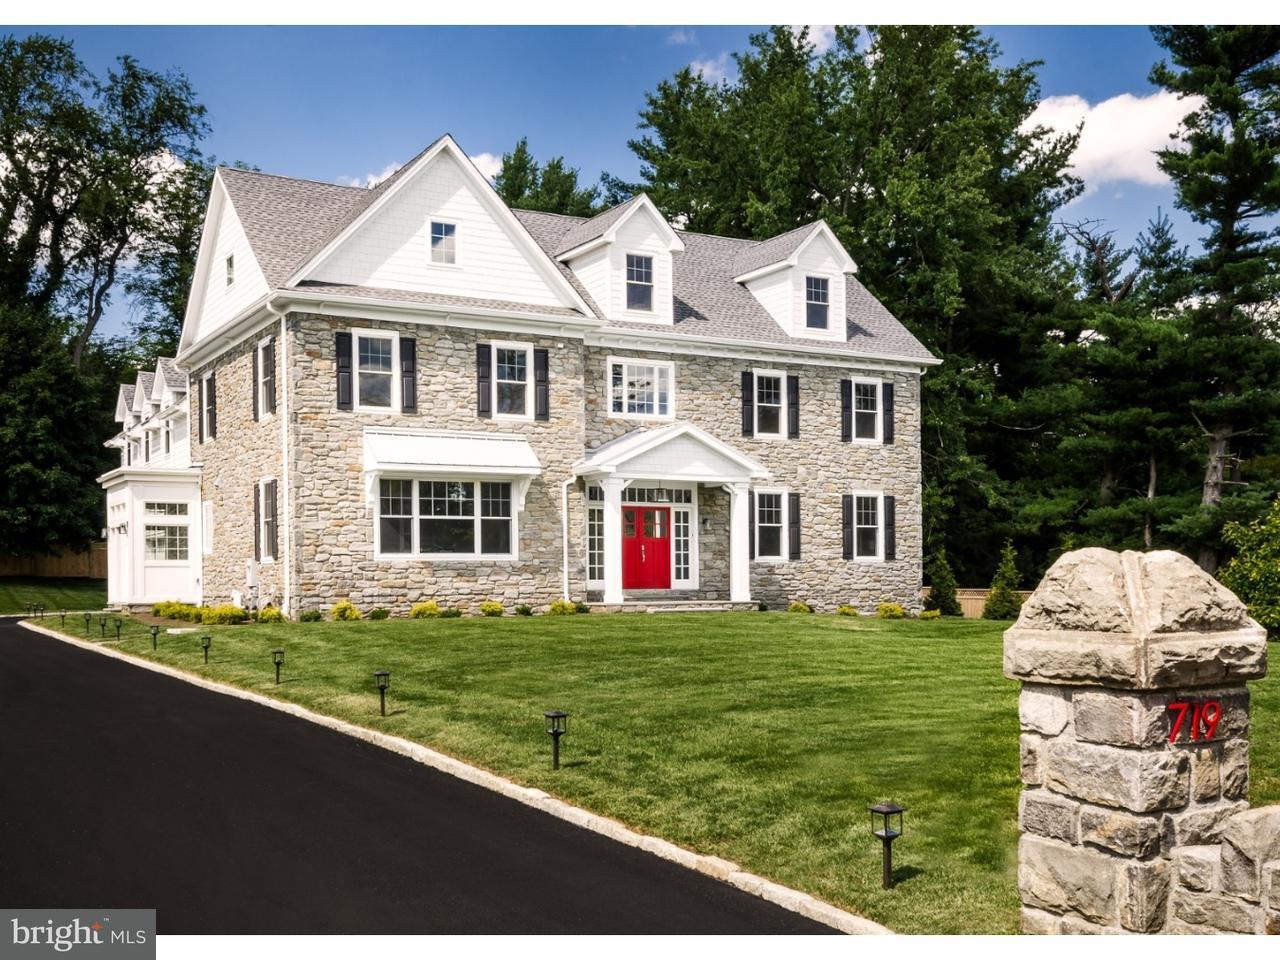 Casa Unifamiliar por un Venta en 719 CONSHOHOCKEN STATE Road Penn Valley, Pennsylvania 19072 Estados Unidos